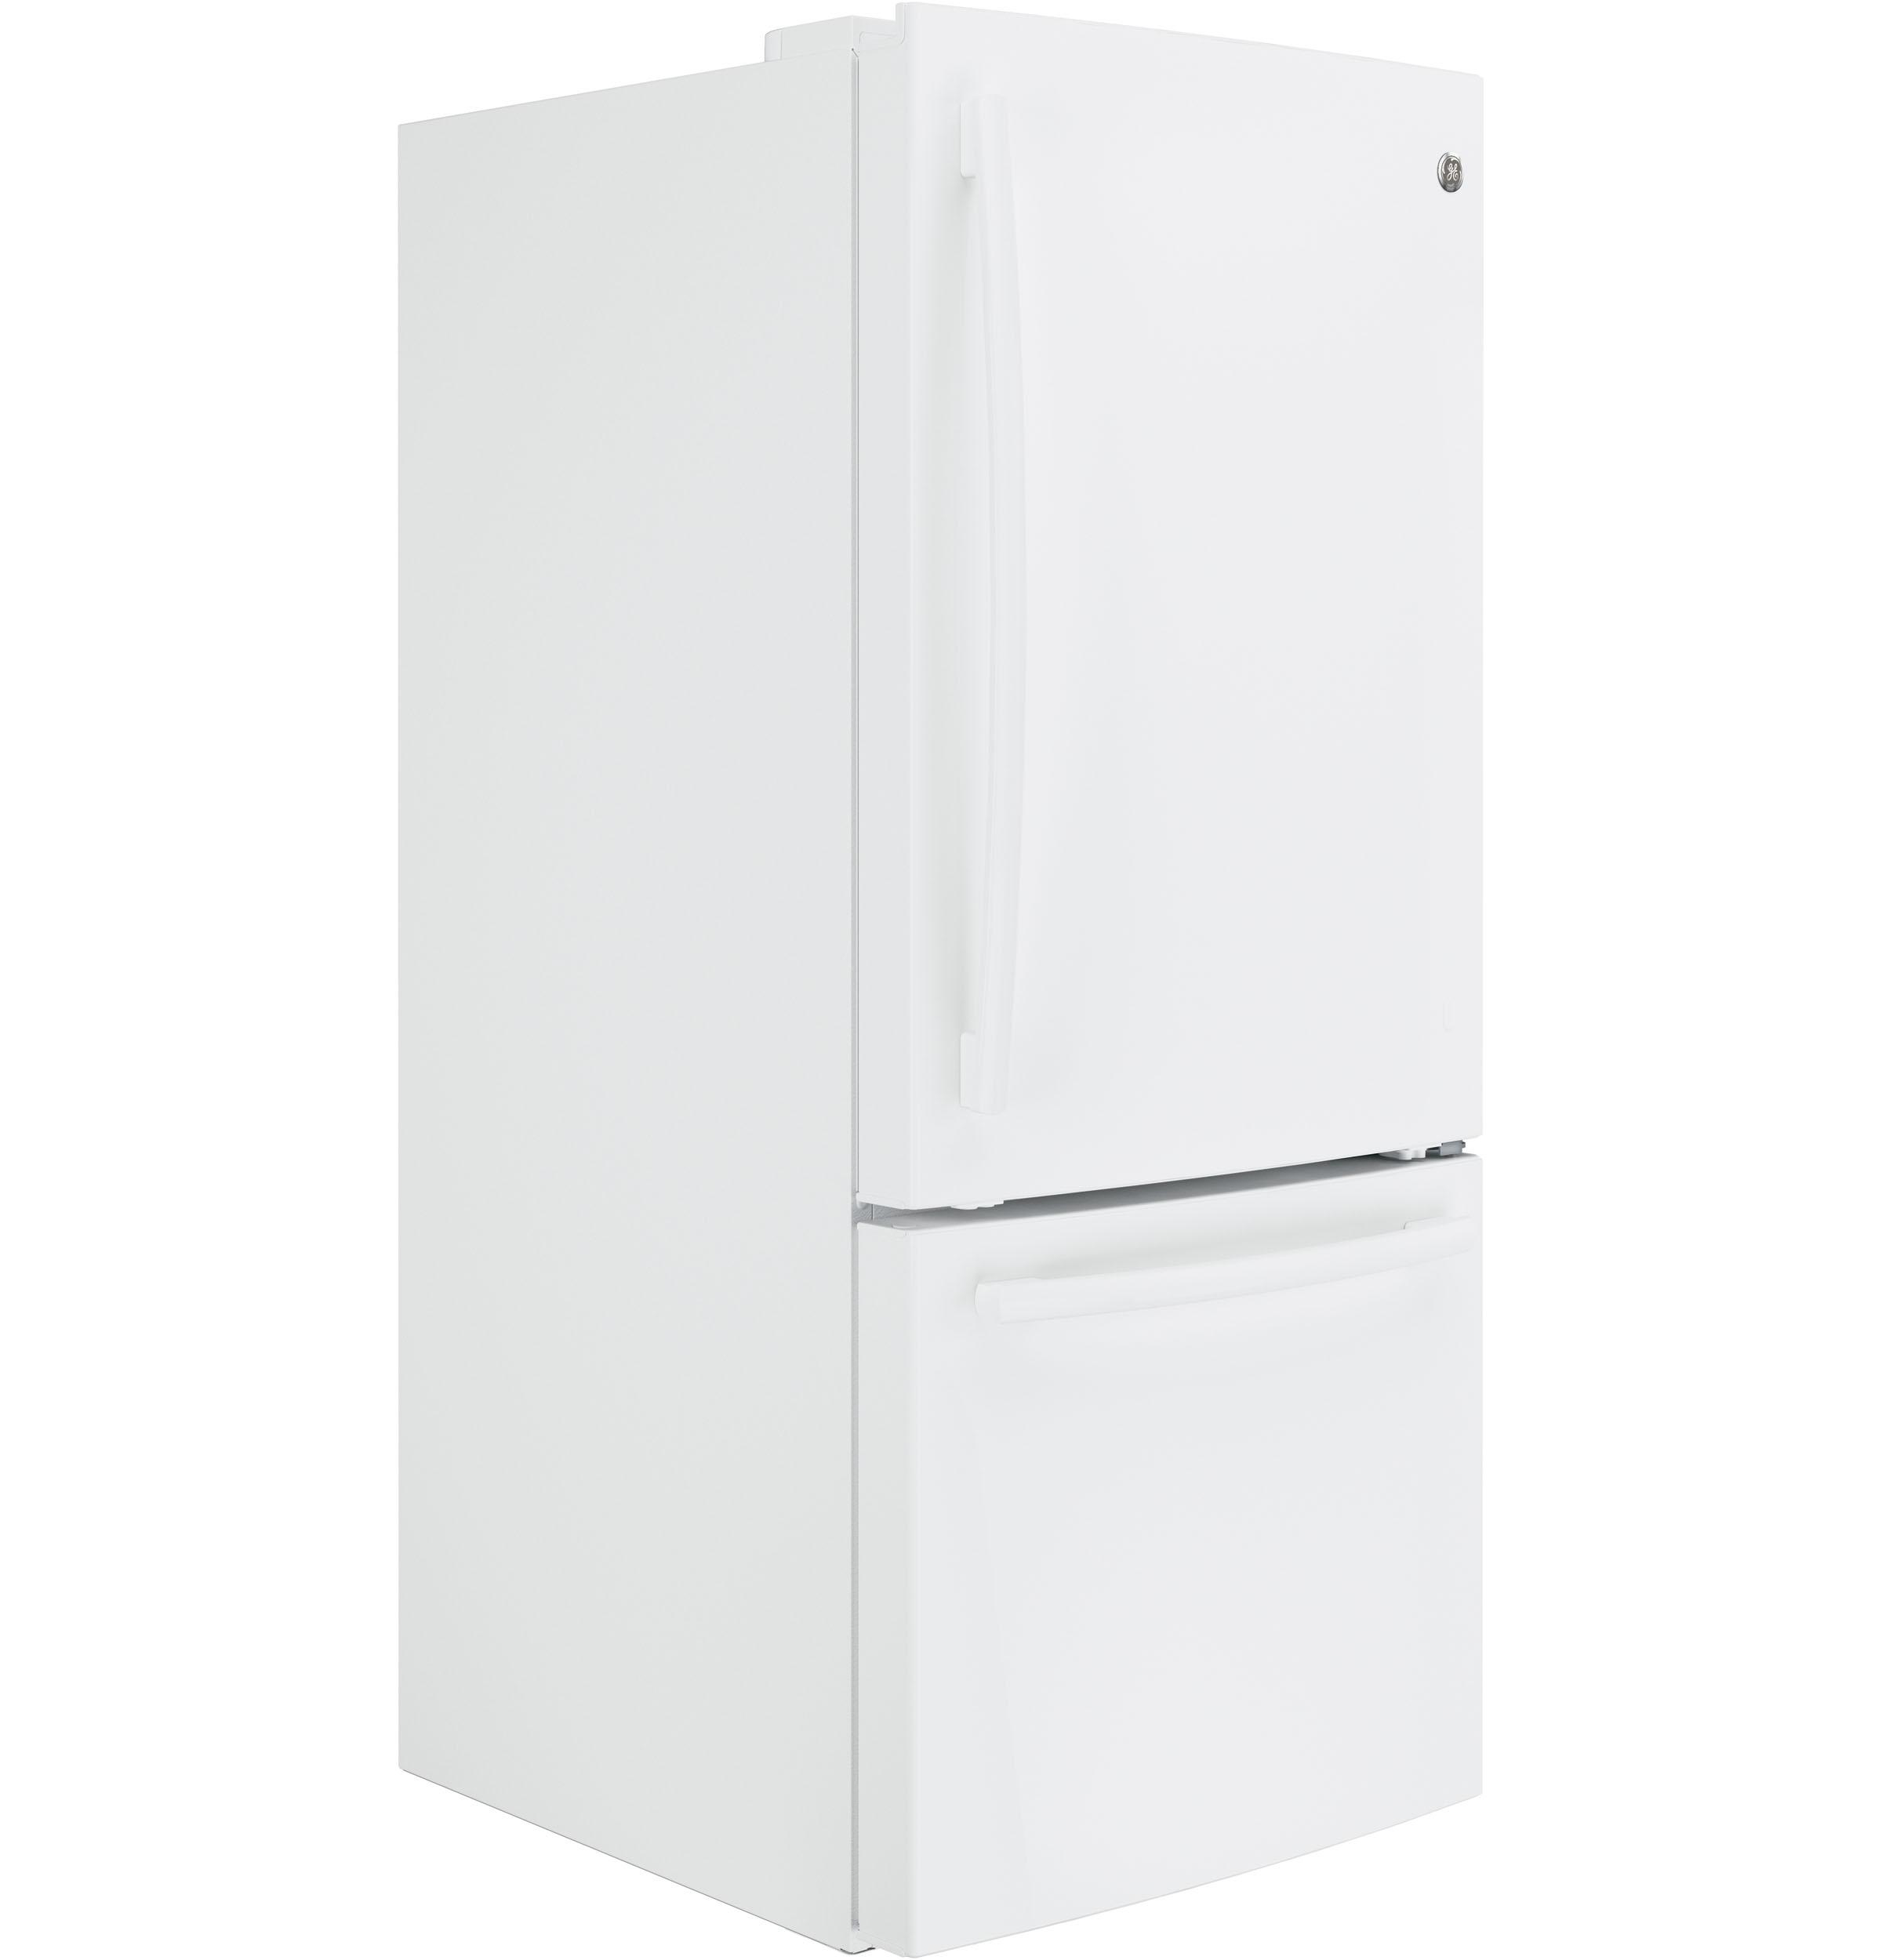 Model: GBE21DGKWW   GE GE® ENERGY STAR® 21.0 Cu. Ft. Bottom-Freezer Refrigerator